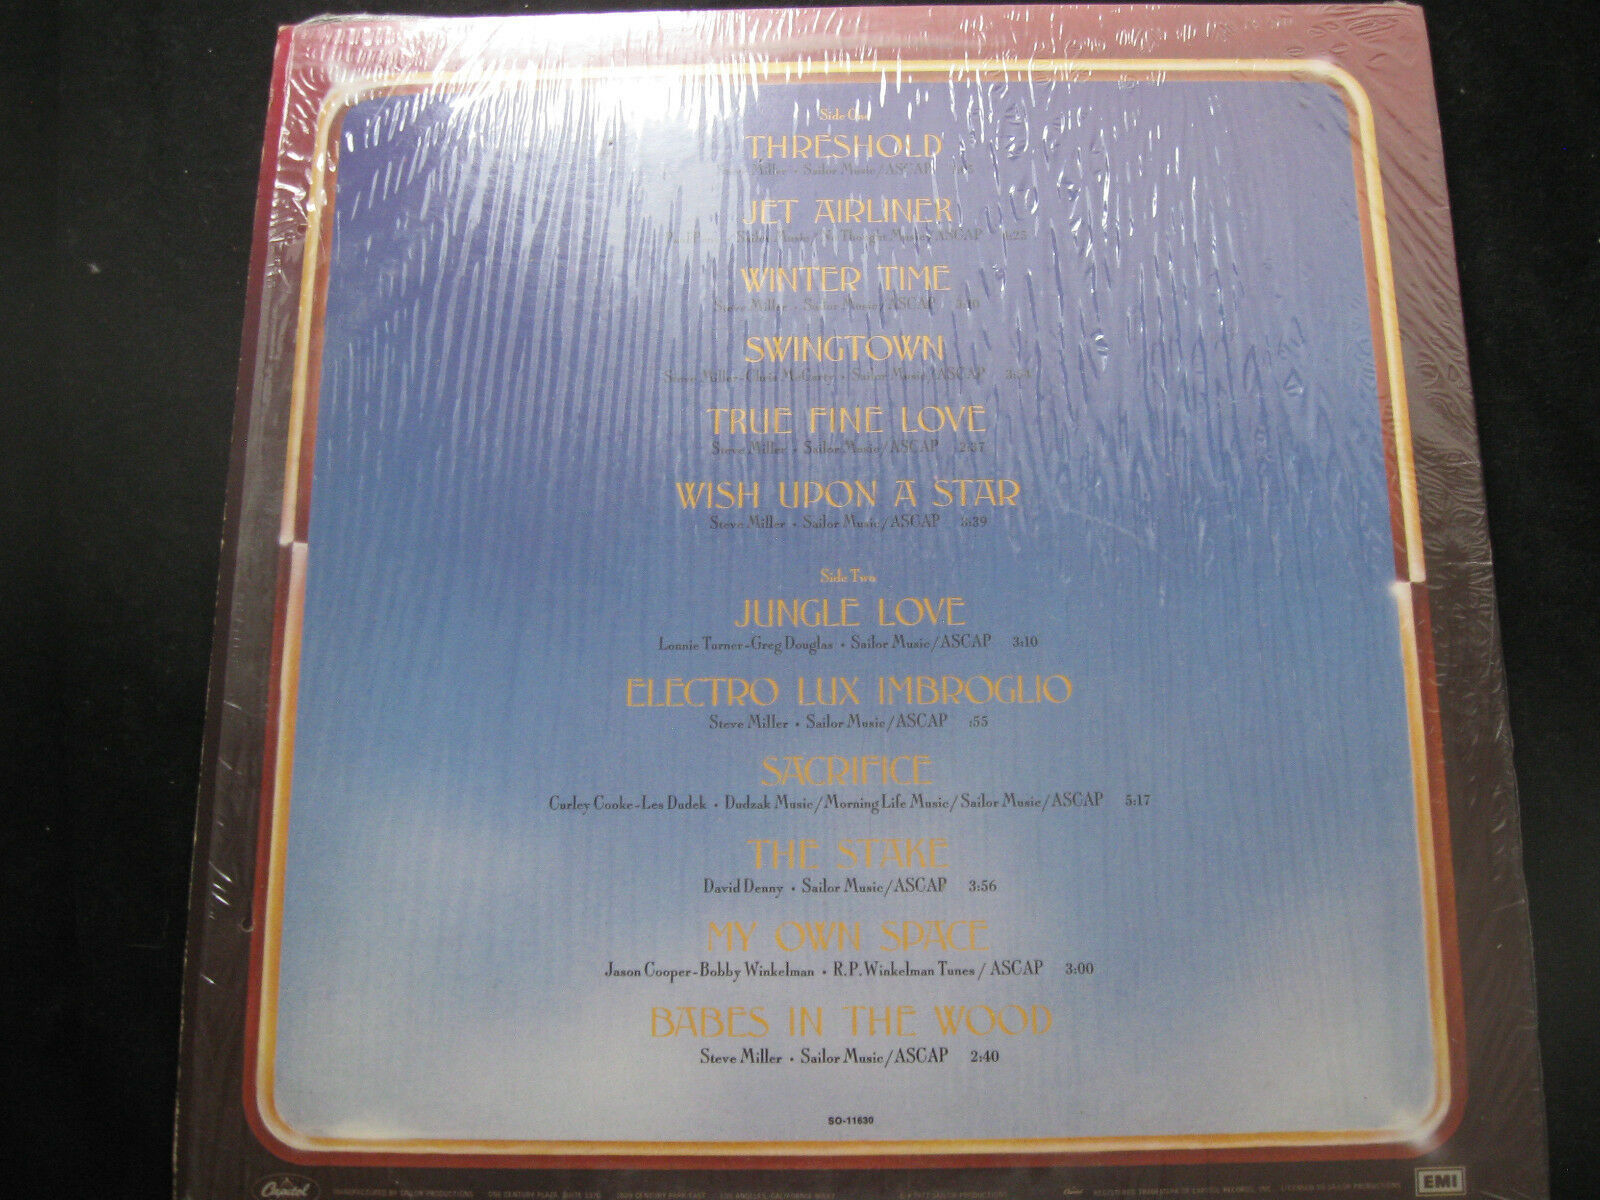 Steve Miller Band Book Of Dreams Capitol SQ-11630 Vinyl Record LP Open Shrink image 2